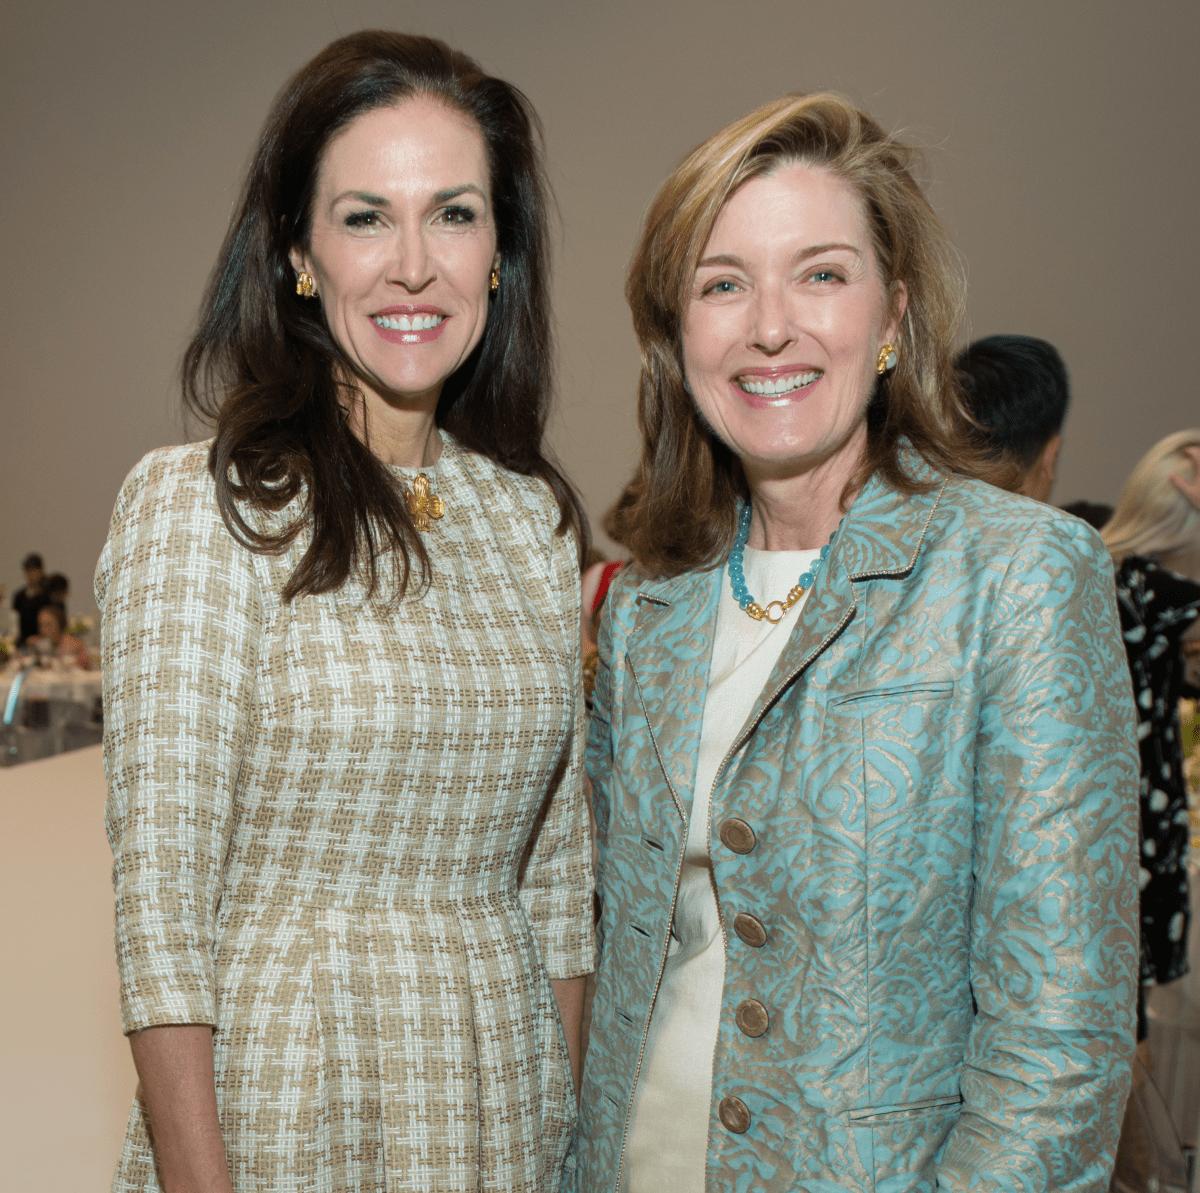 Kathleen Pressler, Carrie Pepi at Oscar de la Renta fashion show at MFAH